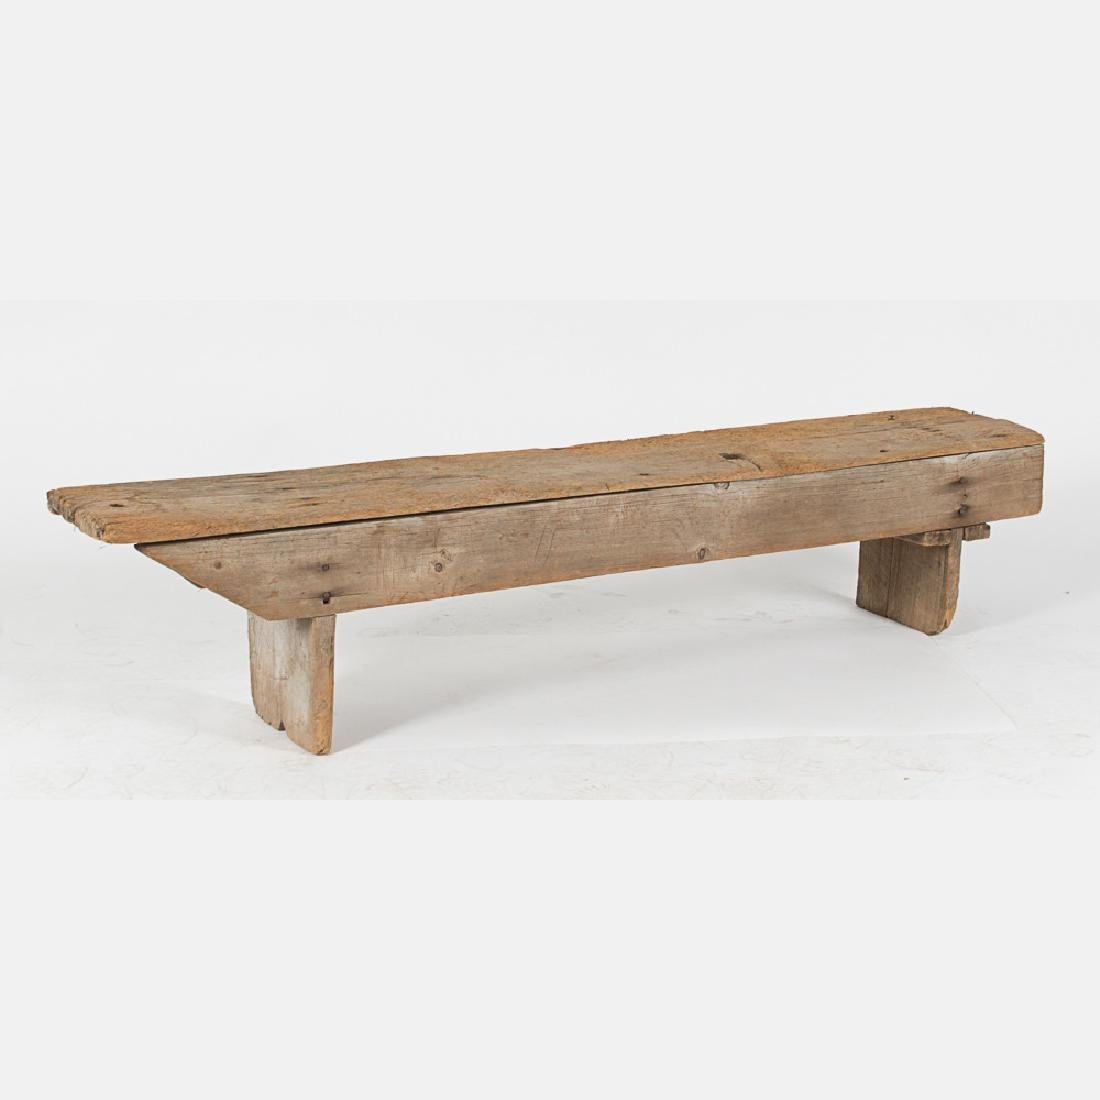 An American Rustic Pine Bench, 19th Century.